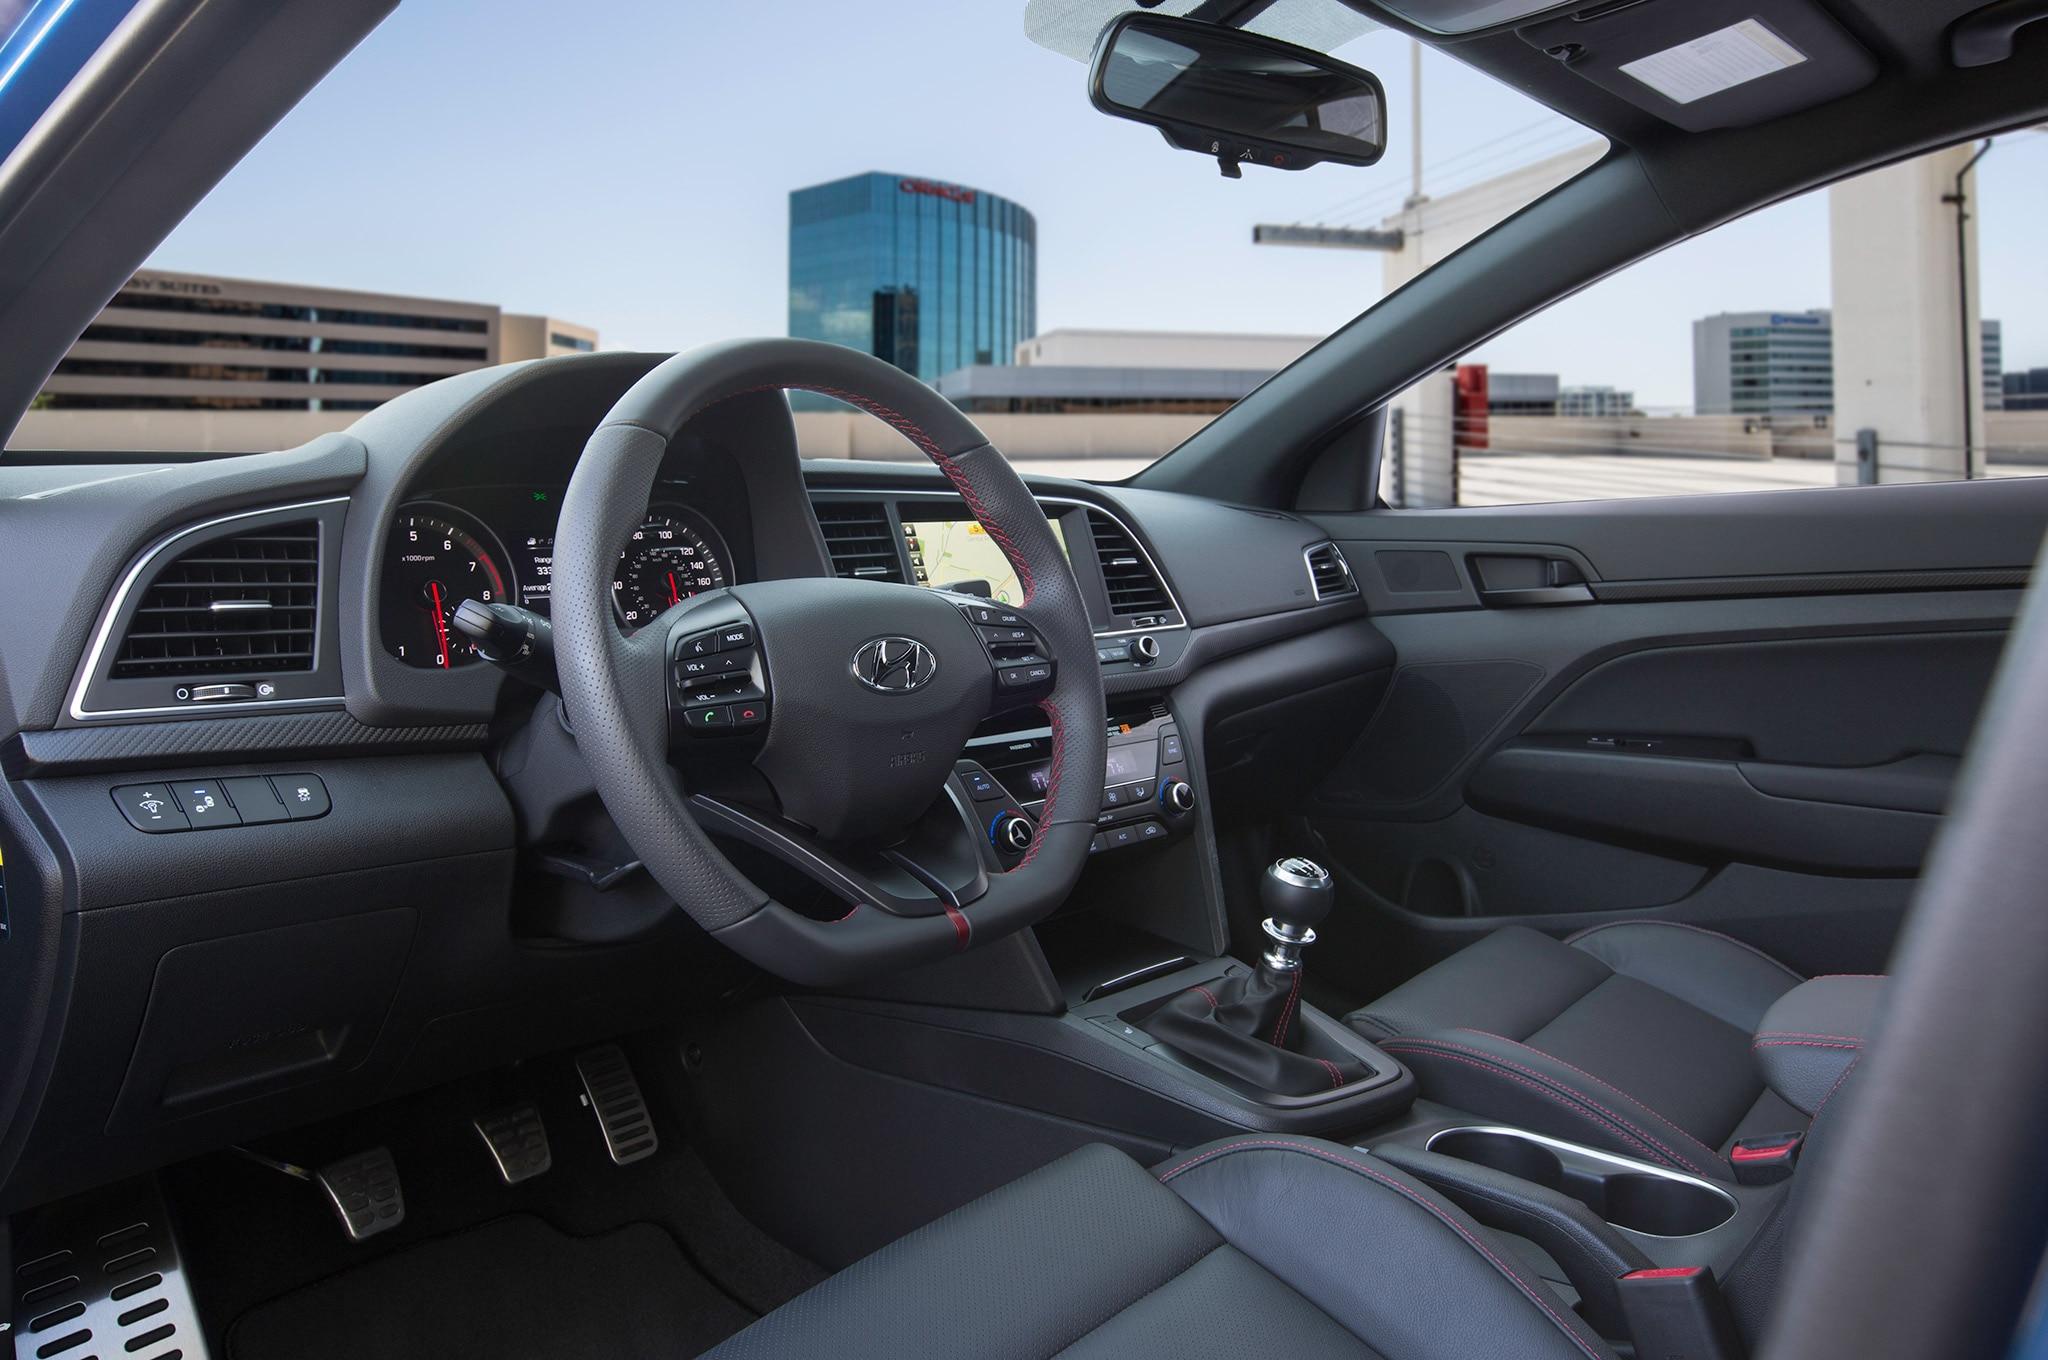 Hyundai Elantra Sport, con motor 1.6 turbo